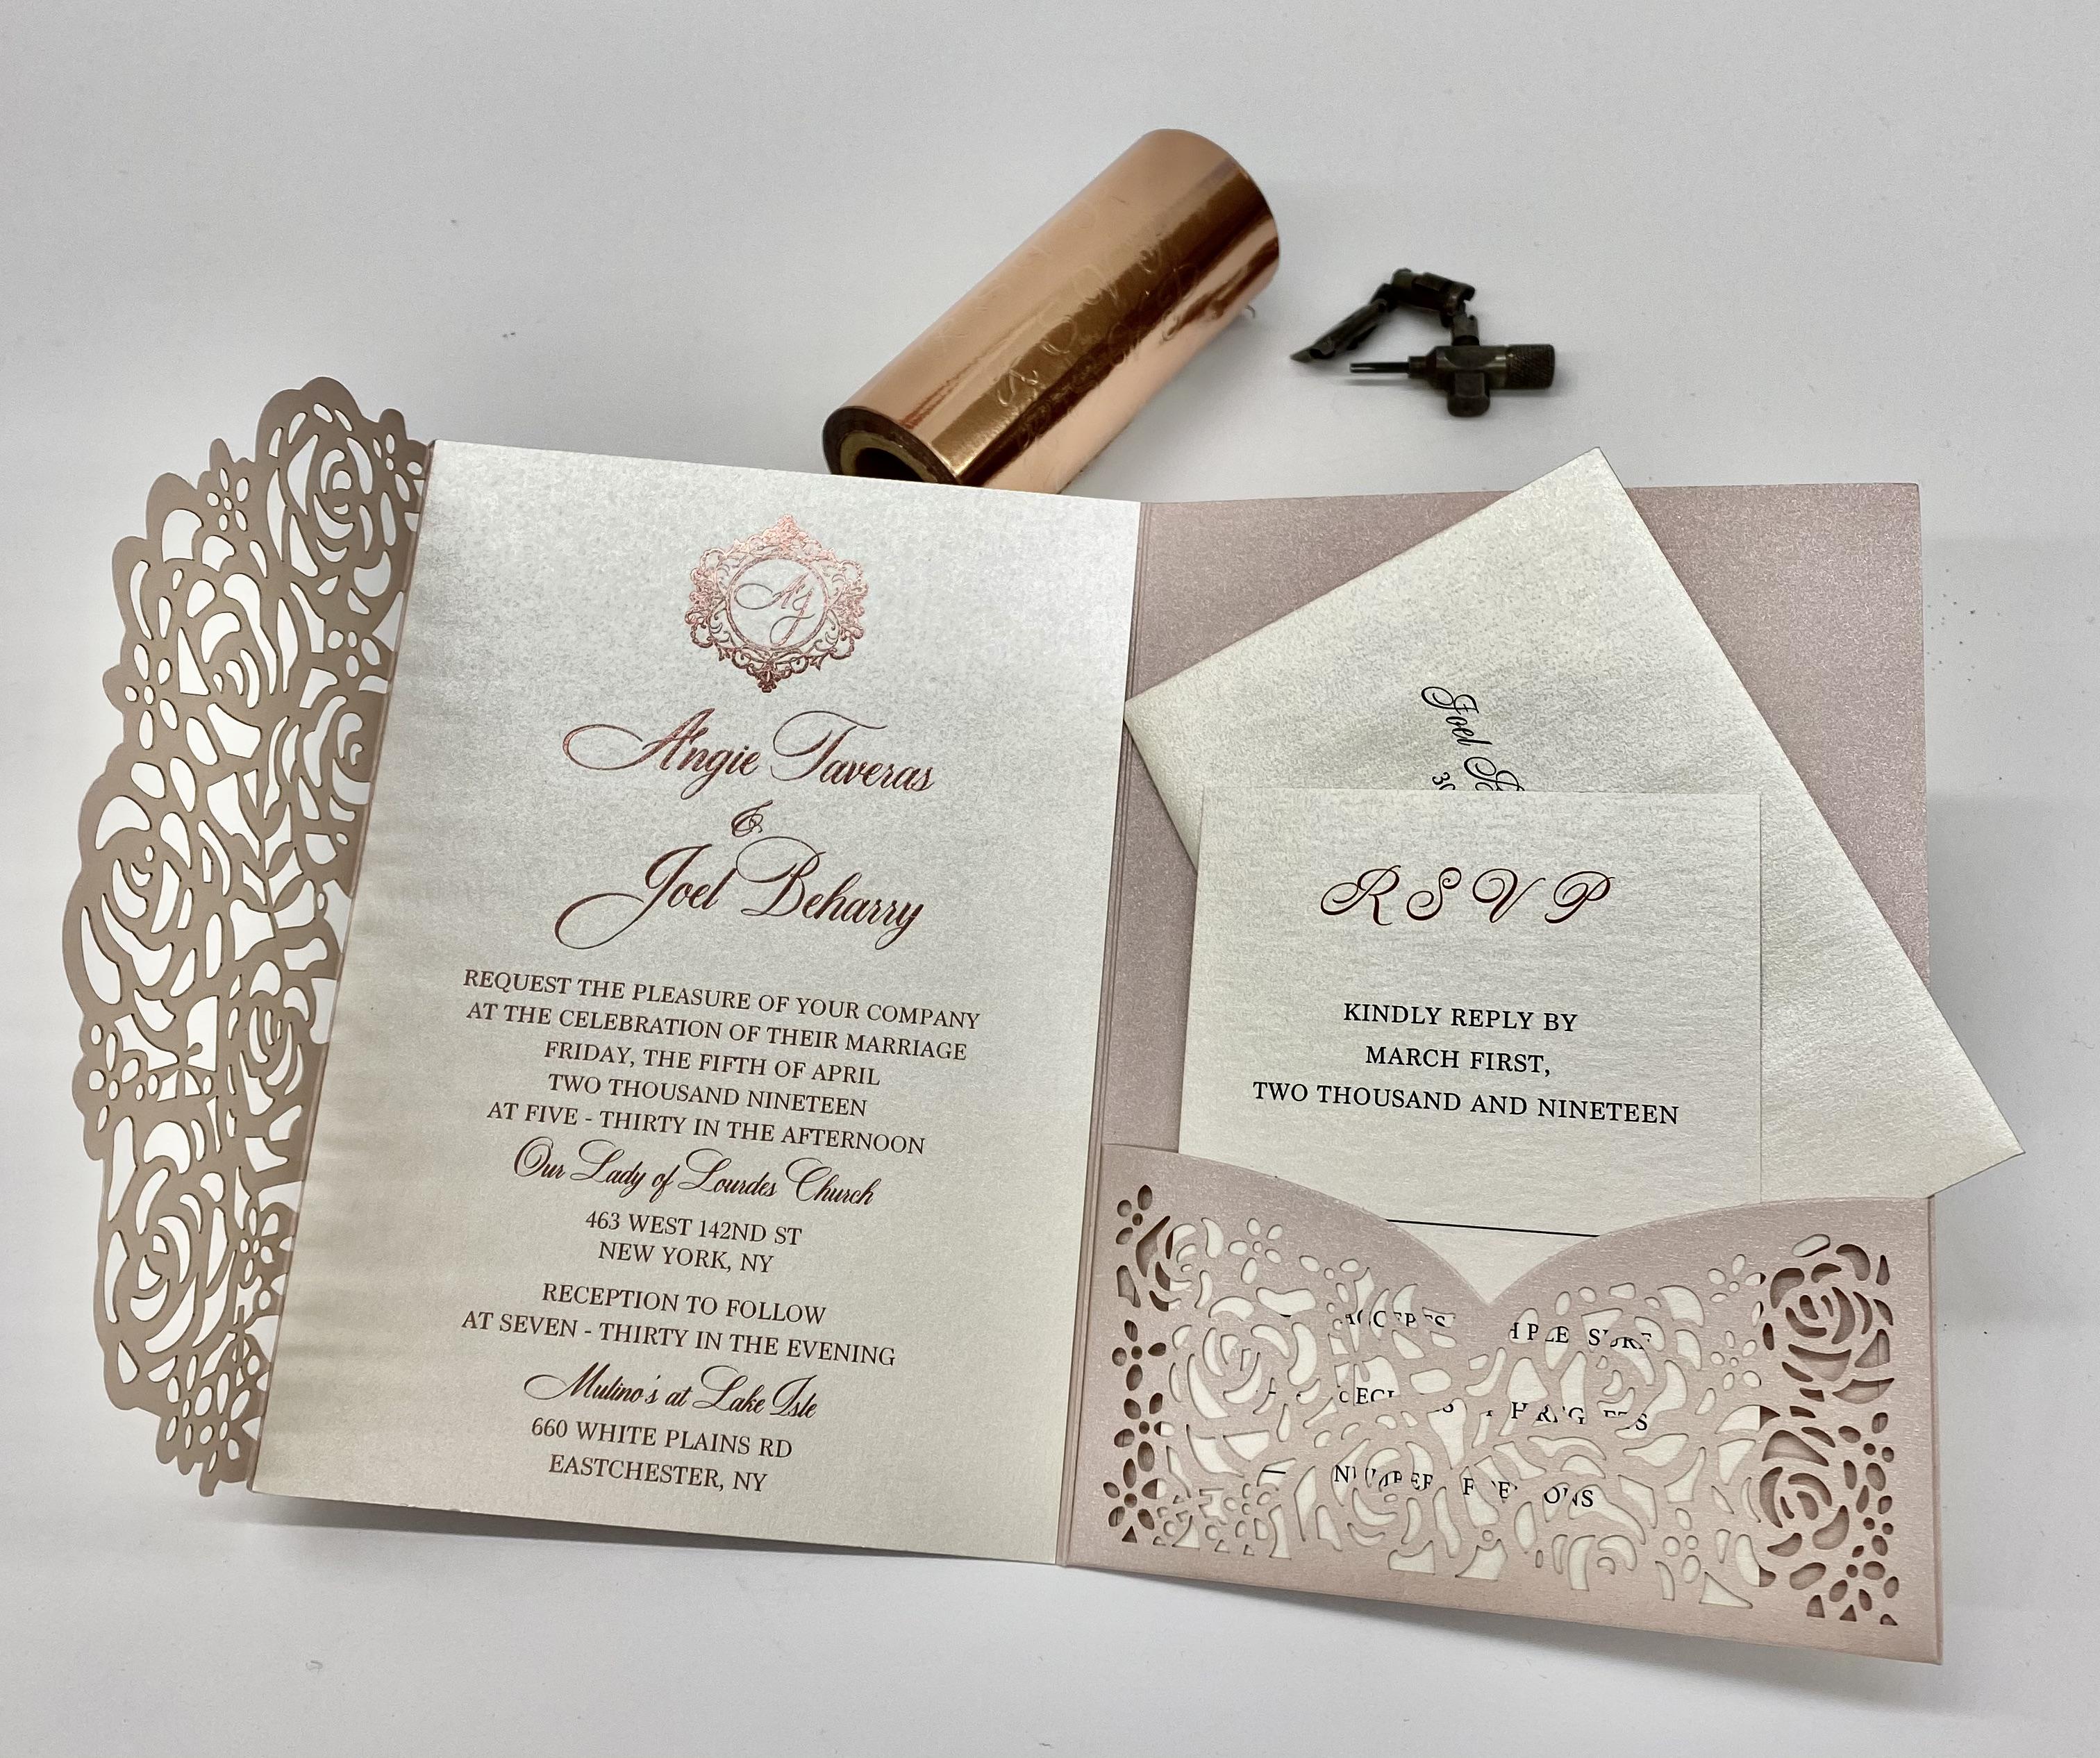 NYC custom invitations studio